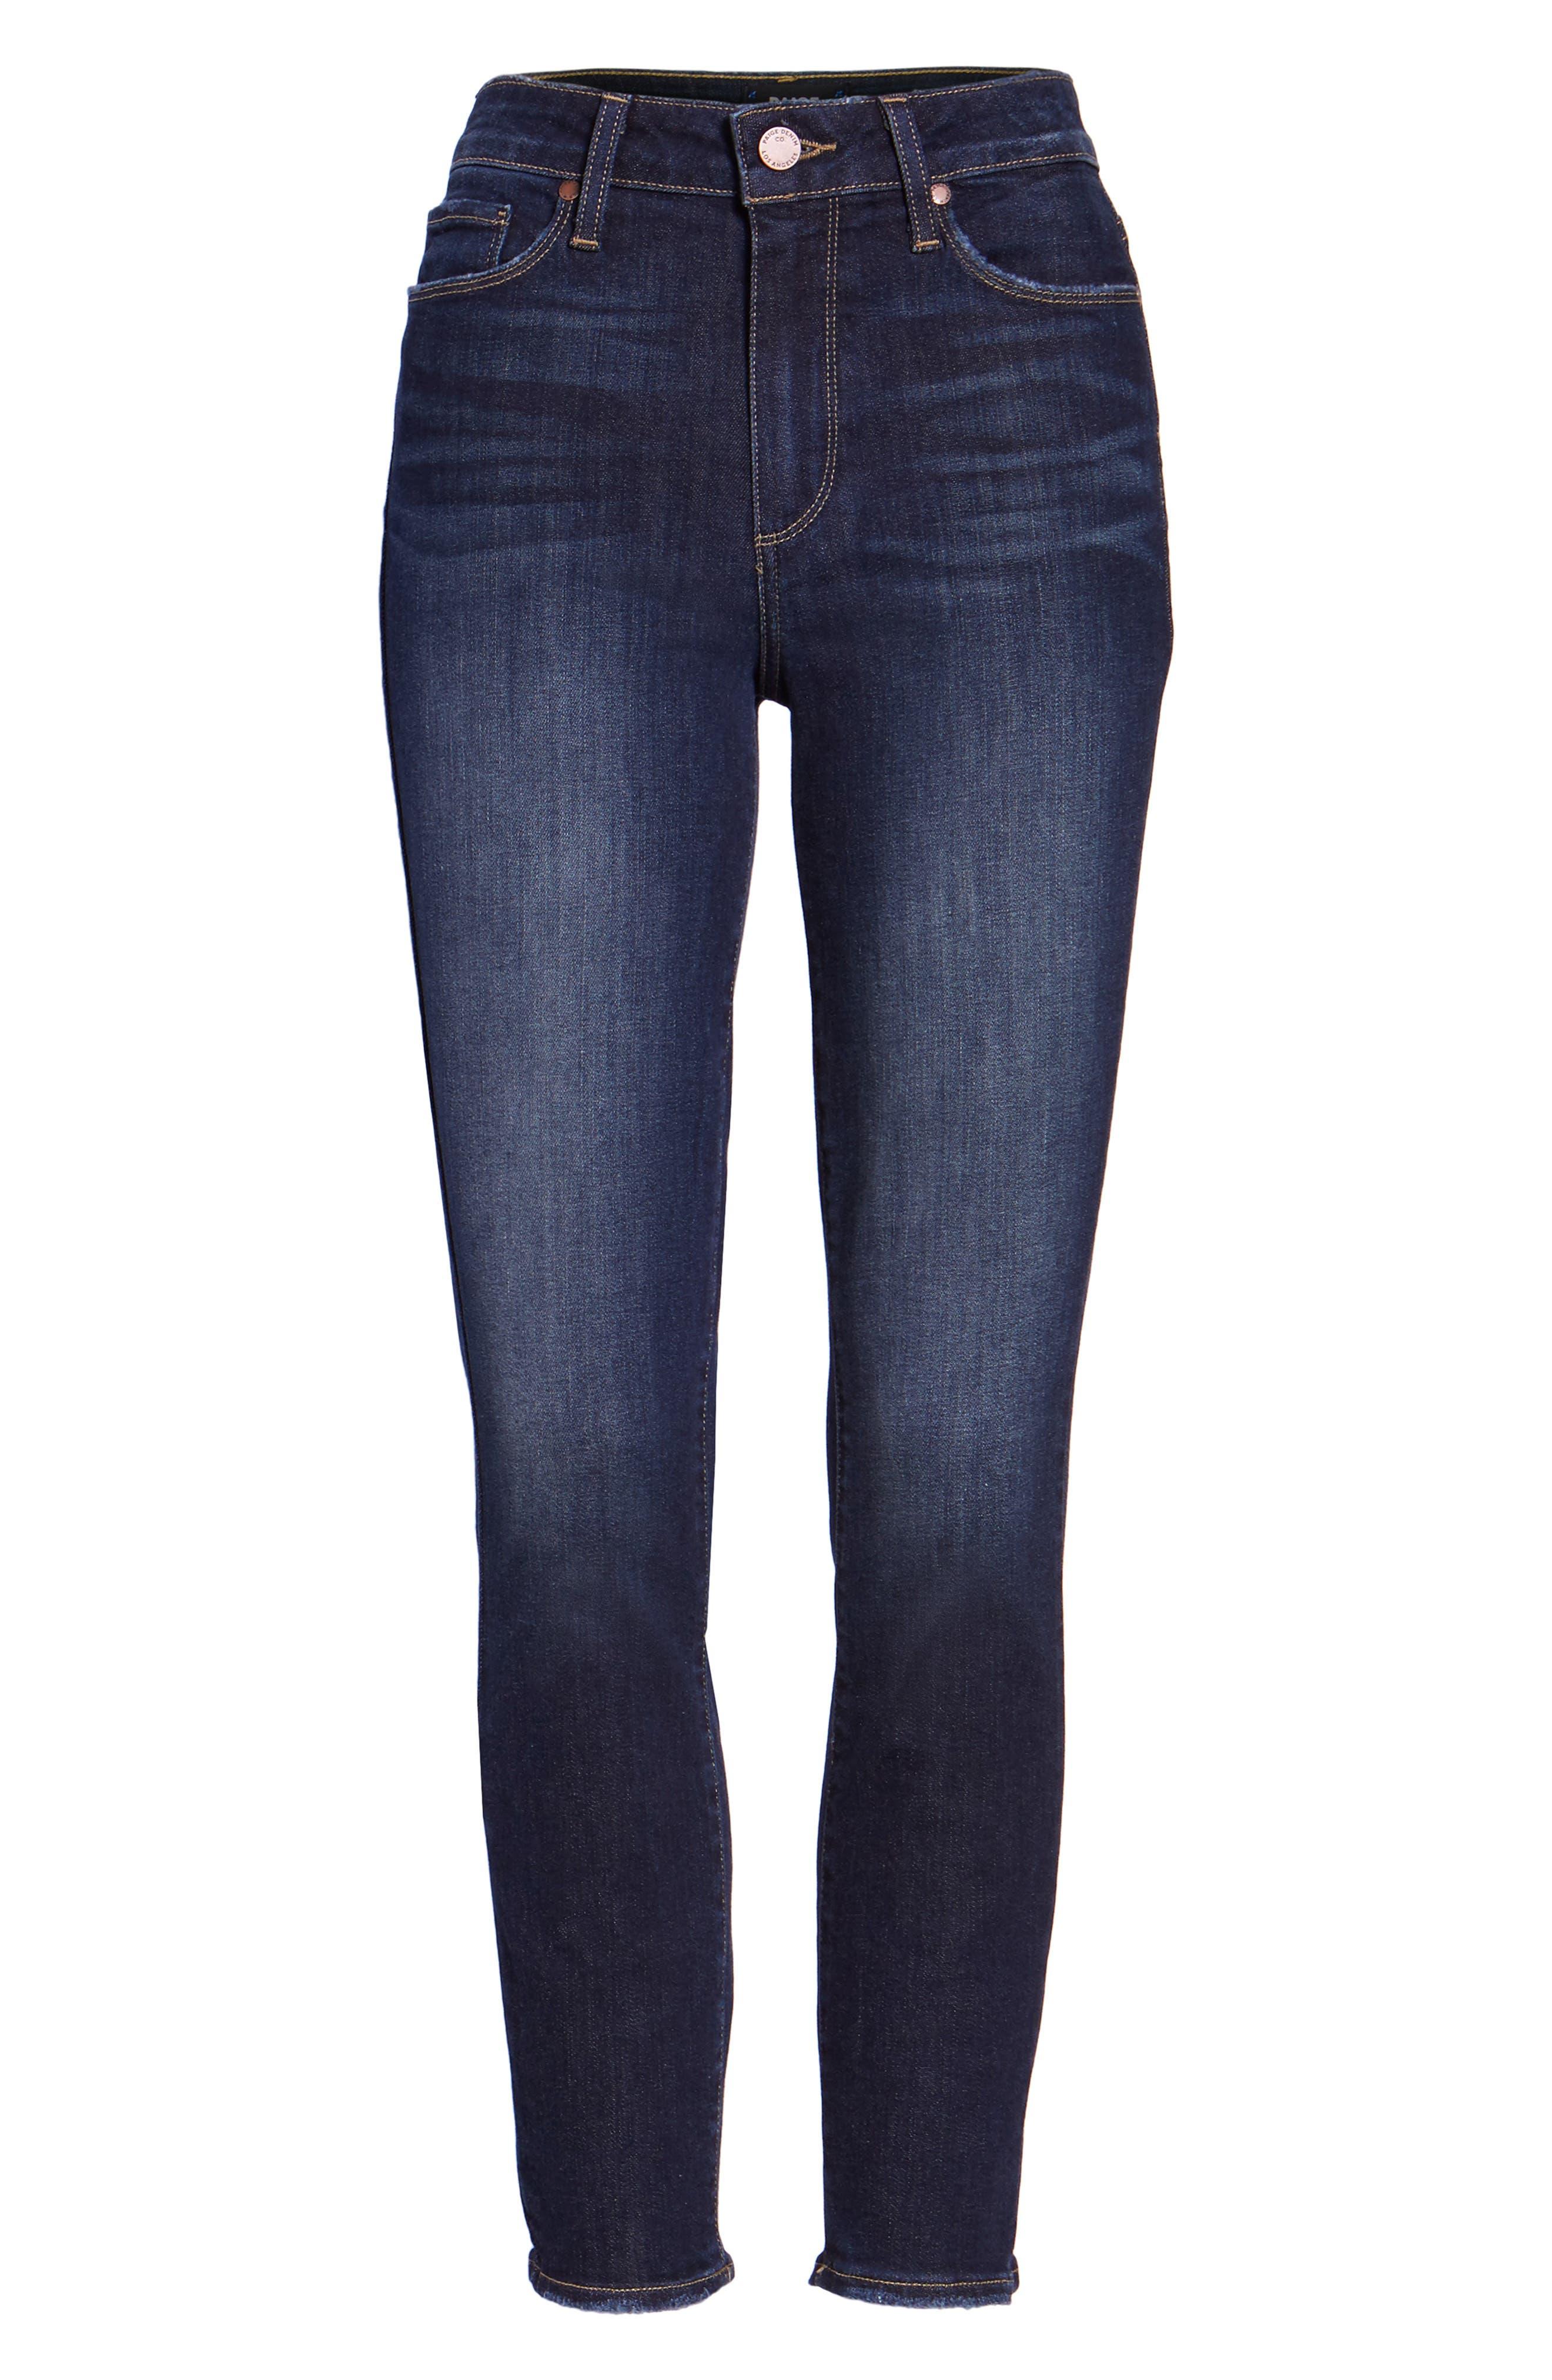 Hoxton Crop High Waist Skinny Jeans,                             Alternate thumbnail 6, color,                             400